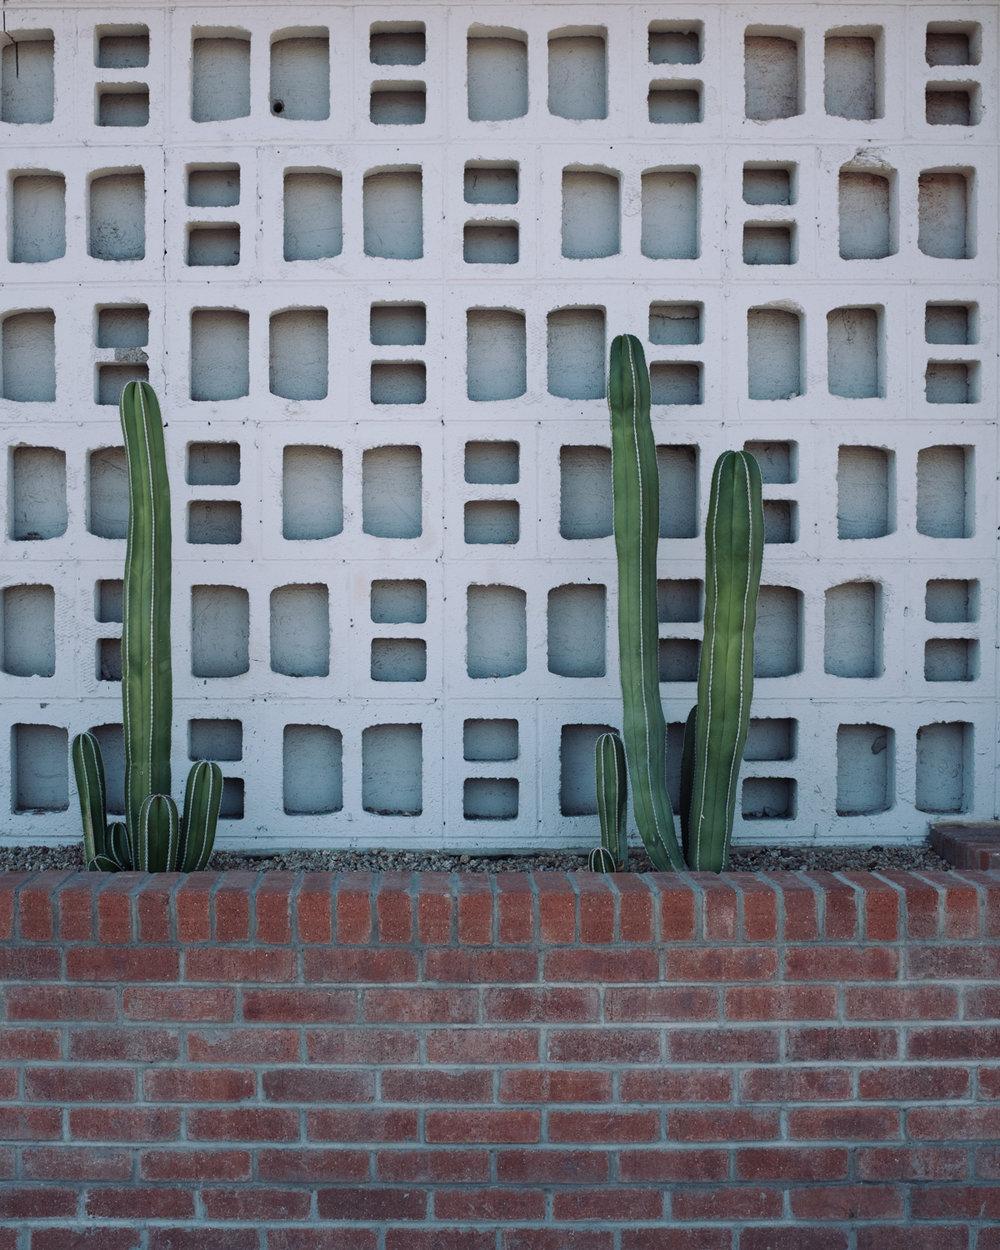 Day 10 - E Camelback Rd, Phoenix